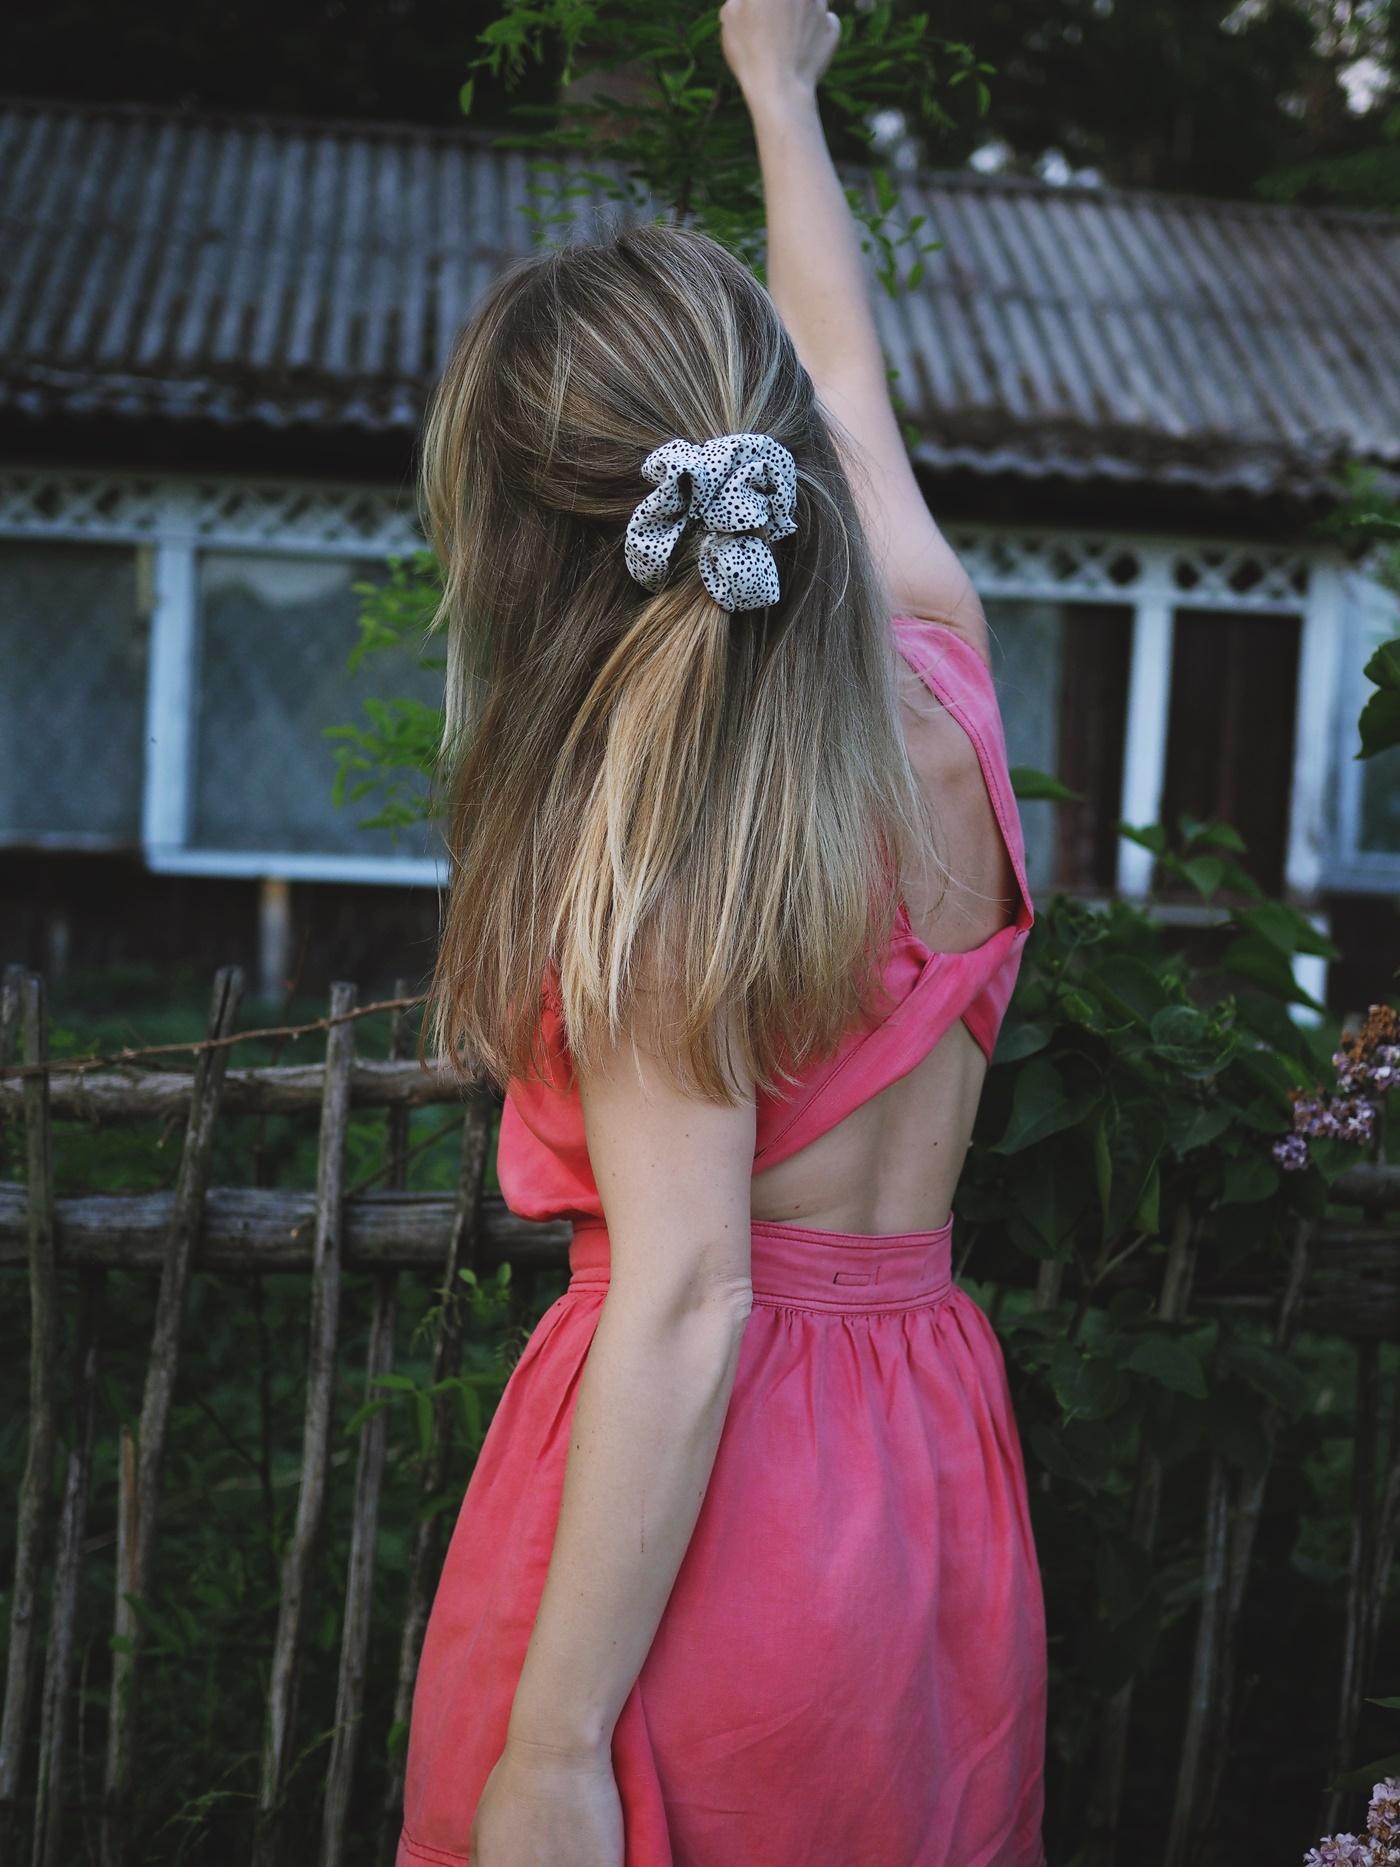 różowa sukienka na lato